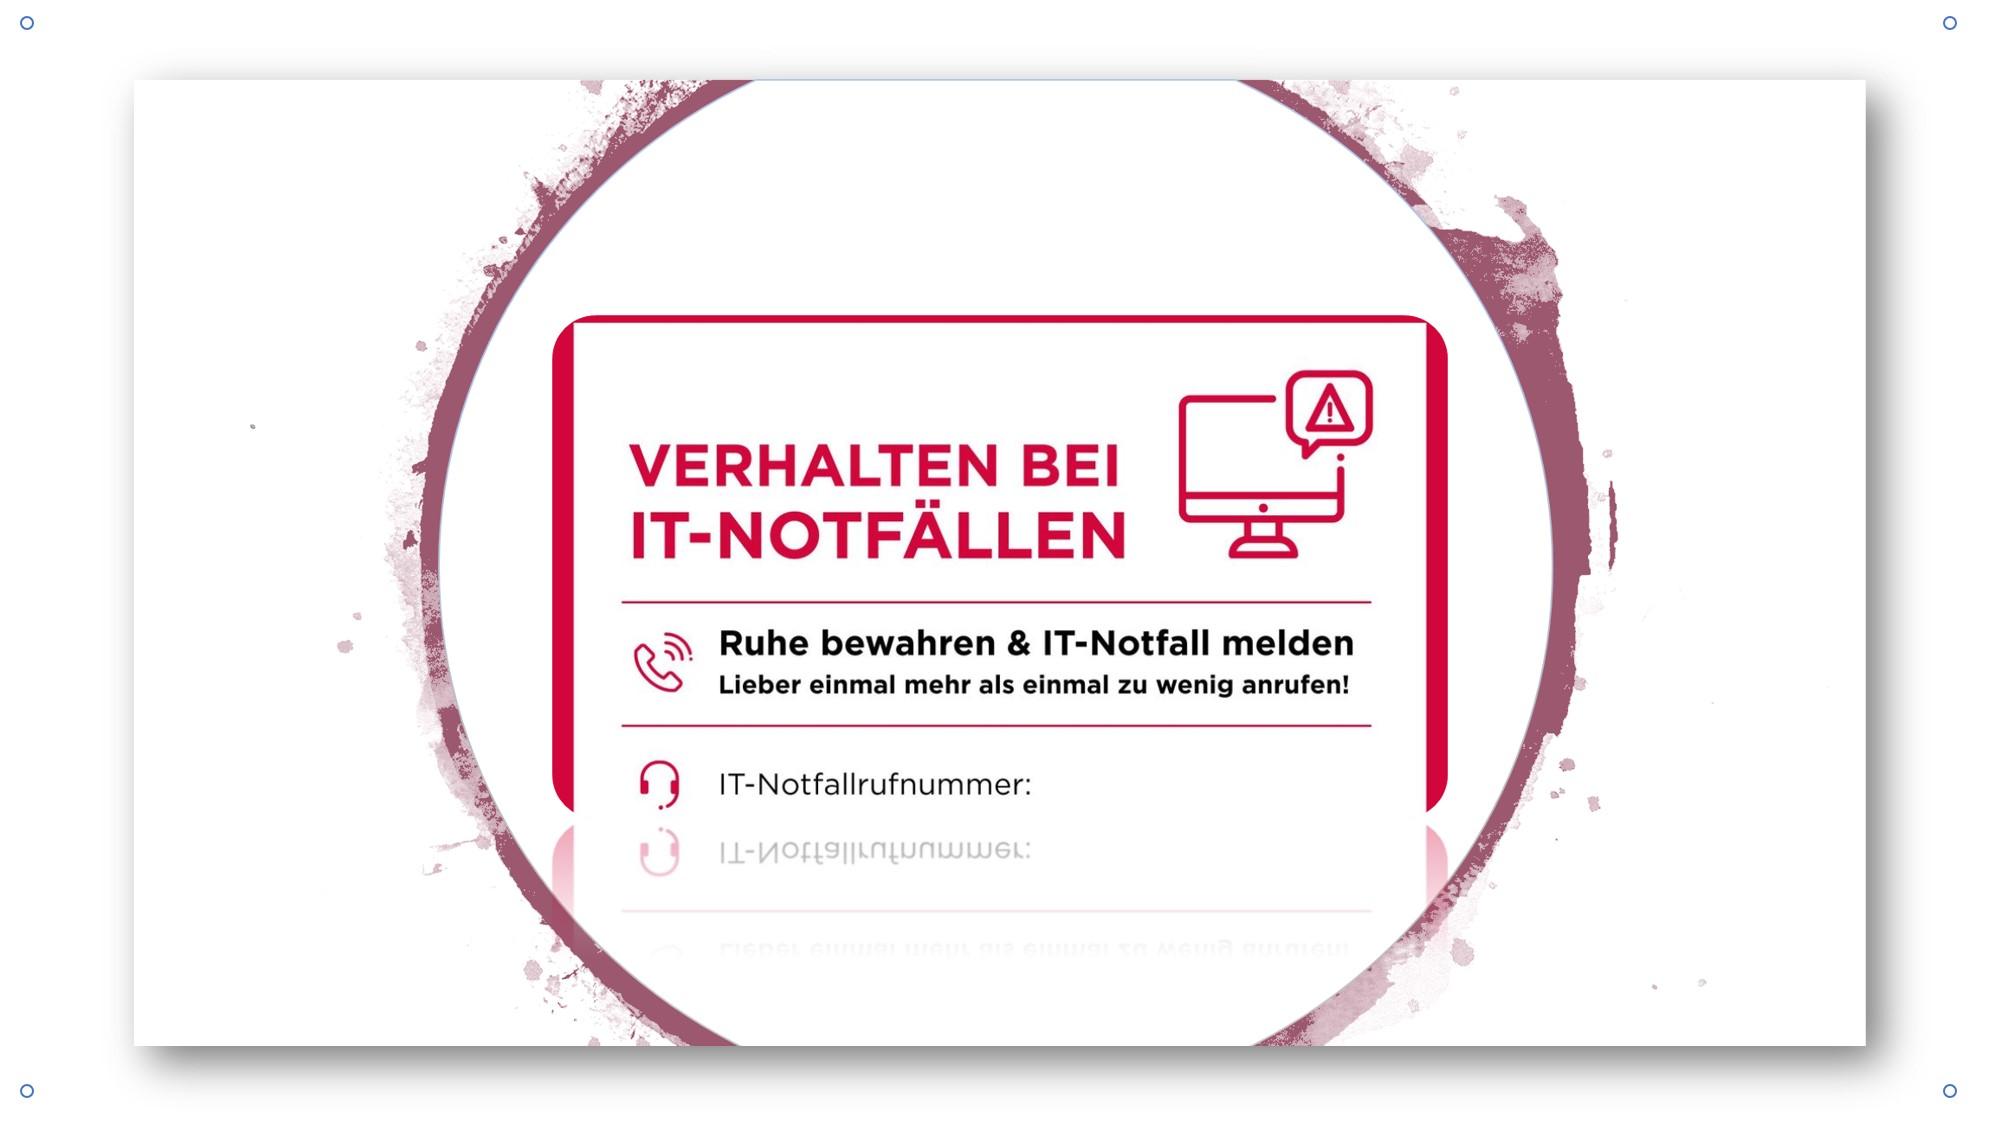 IT-Basissicherheit_IT-Notfallplan